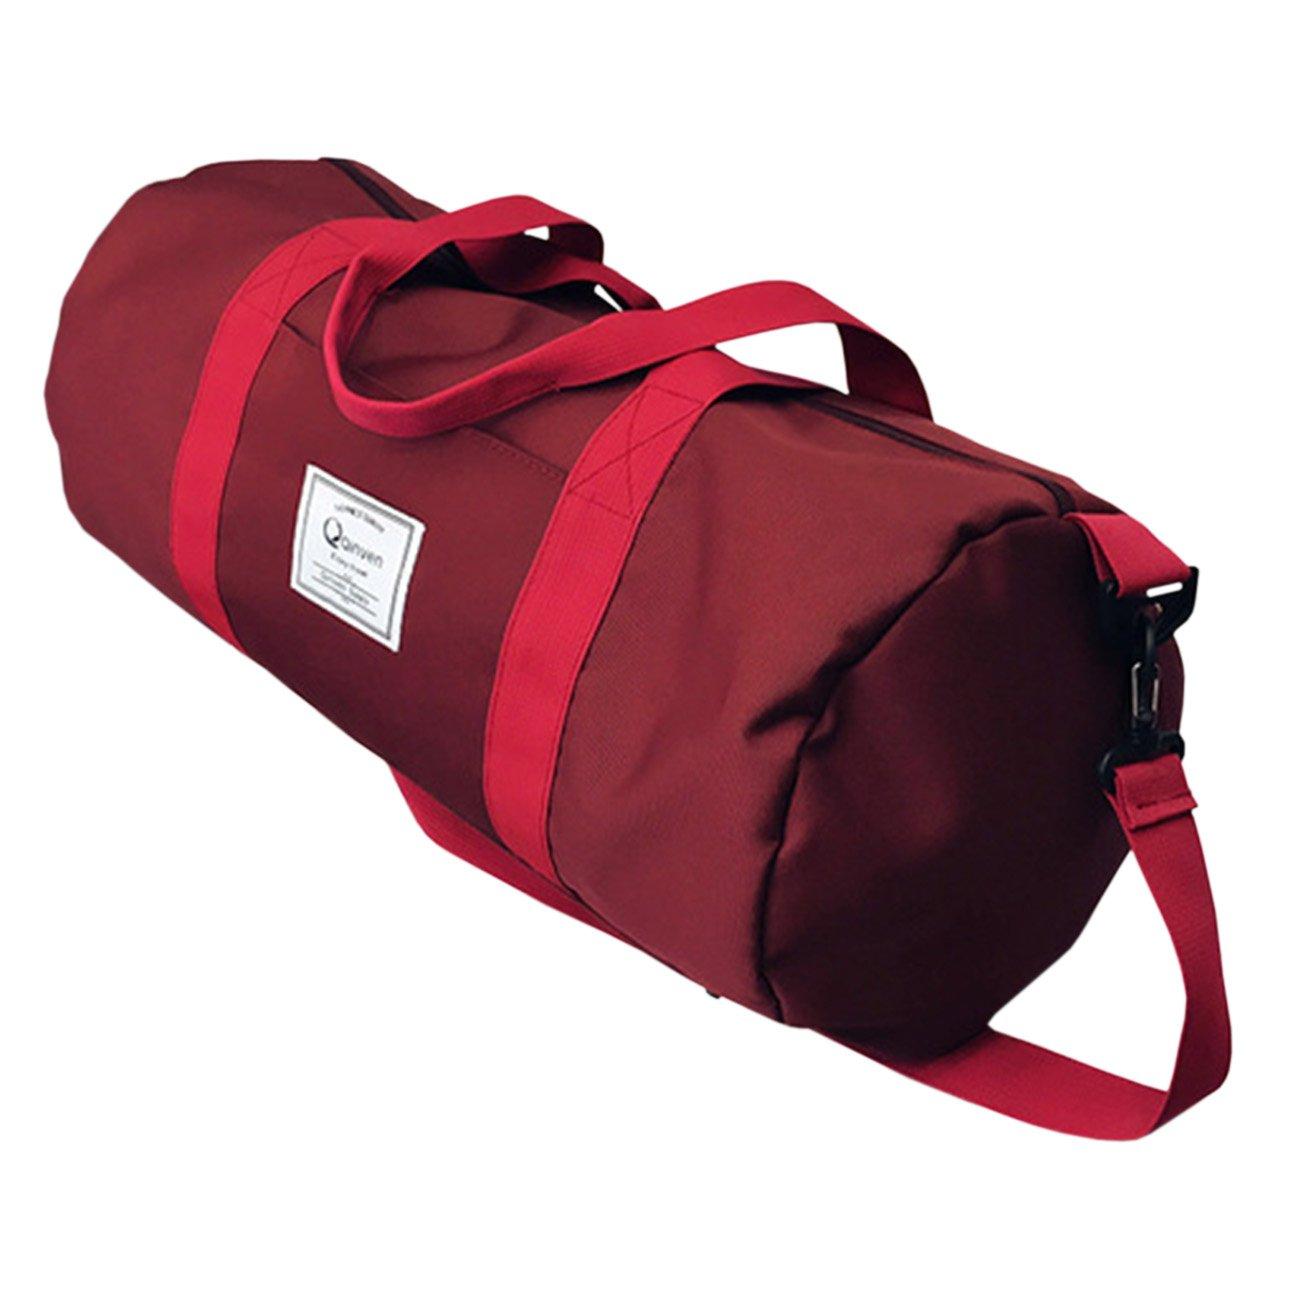 THEE Women Men High Capacity Waterproof Sports Bag Travel Tote Bag PFFPBB649bk